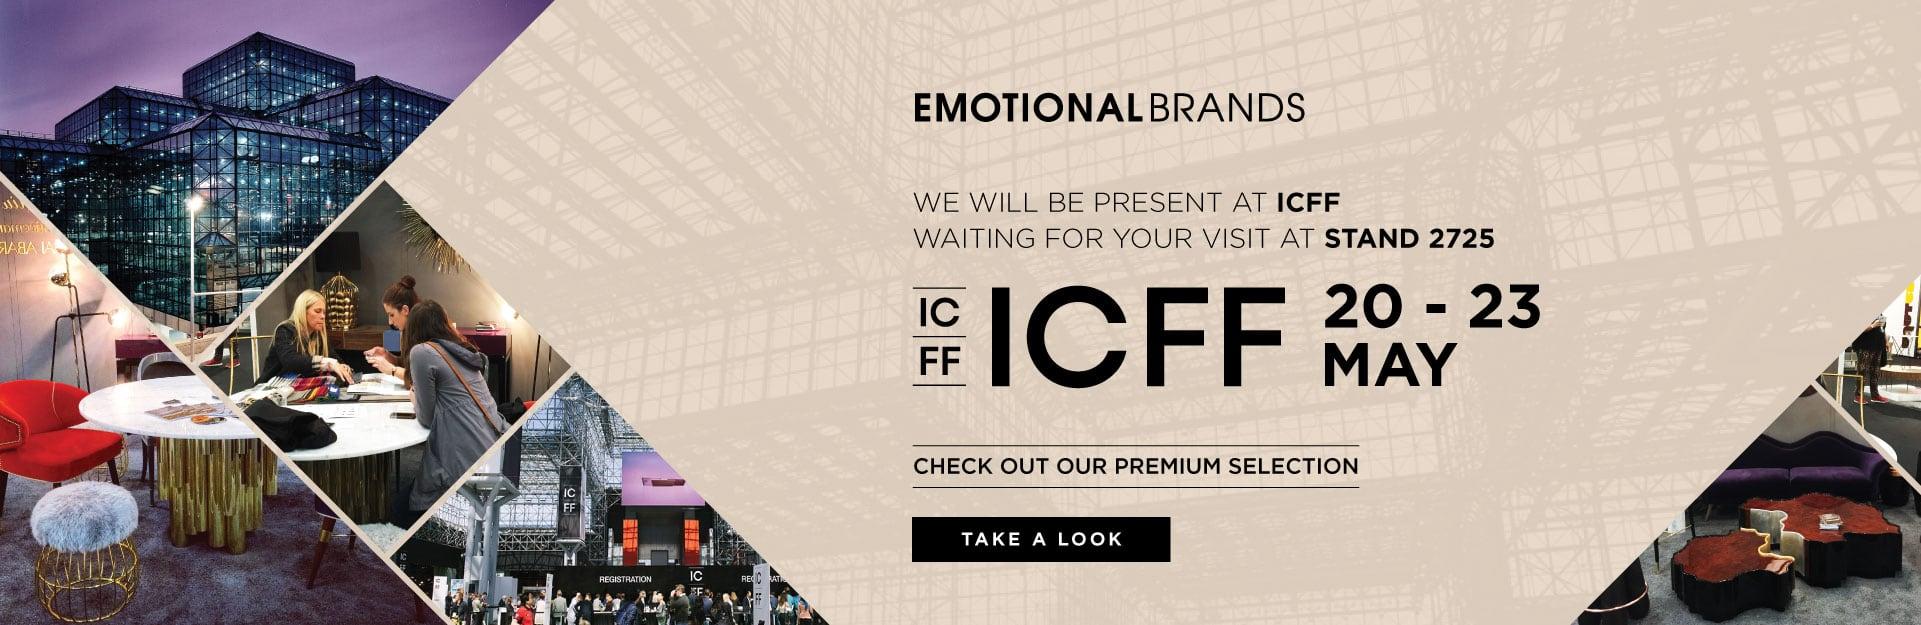 ICFF 2018 @ New York